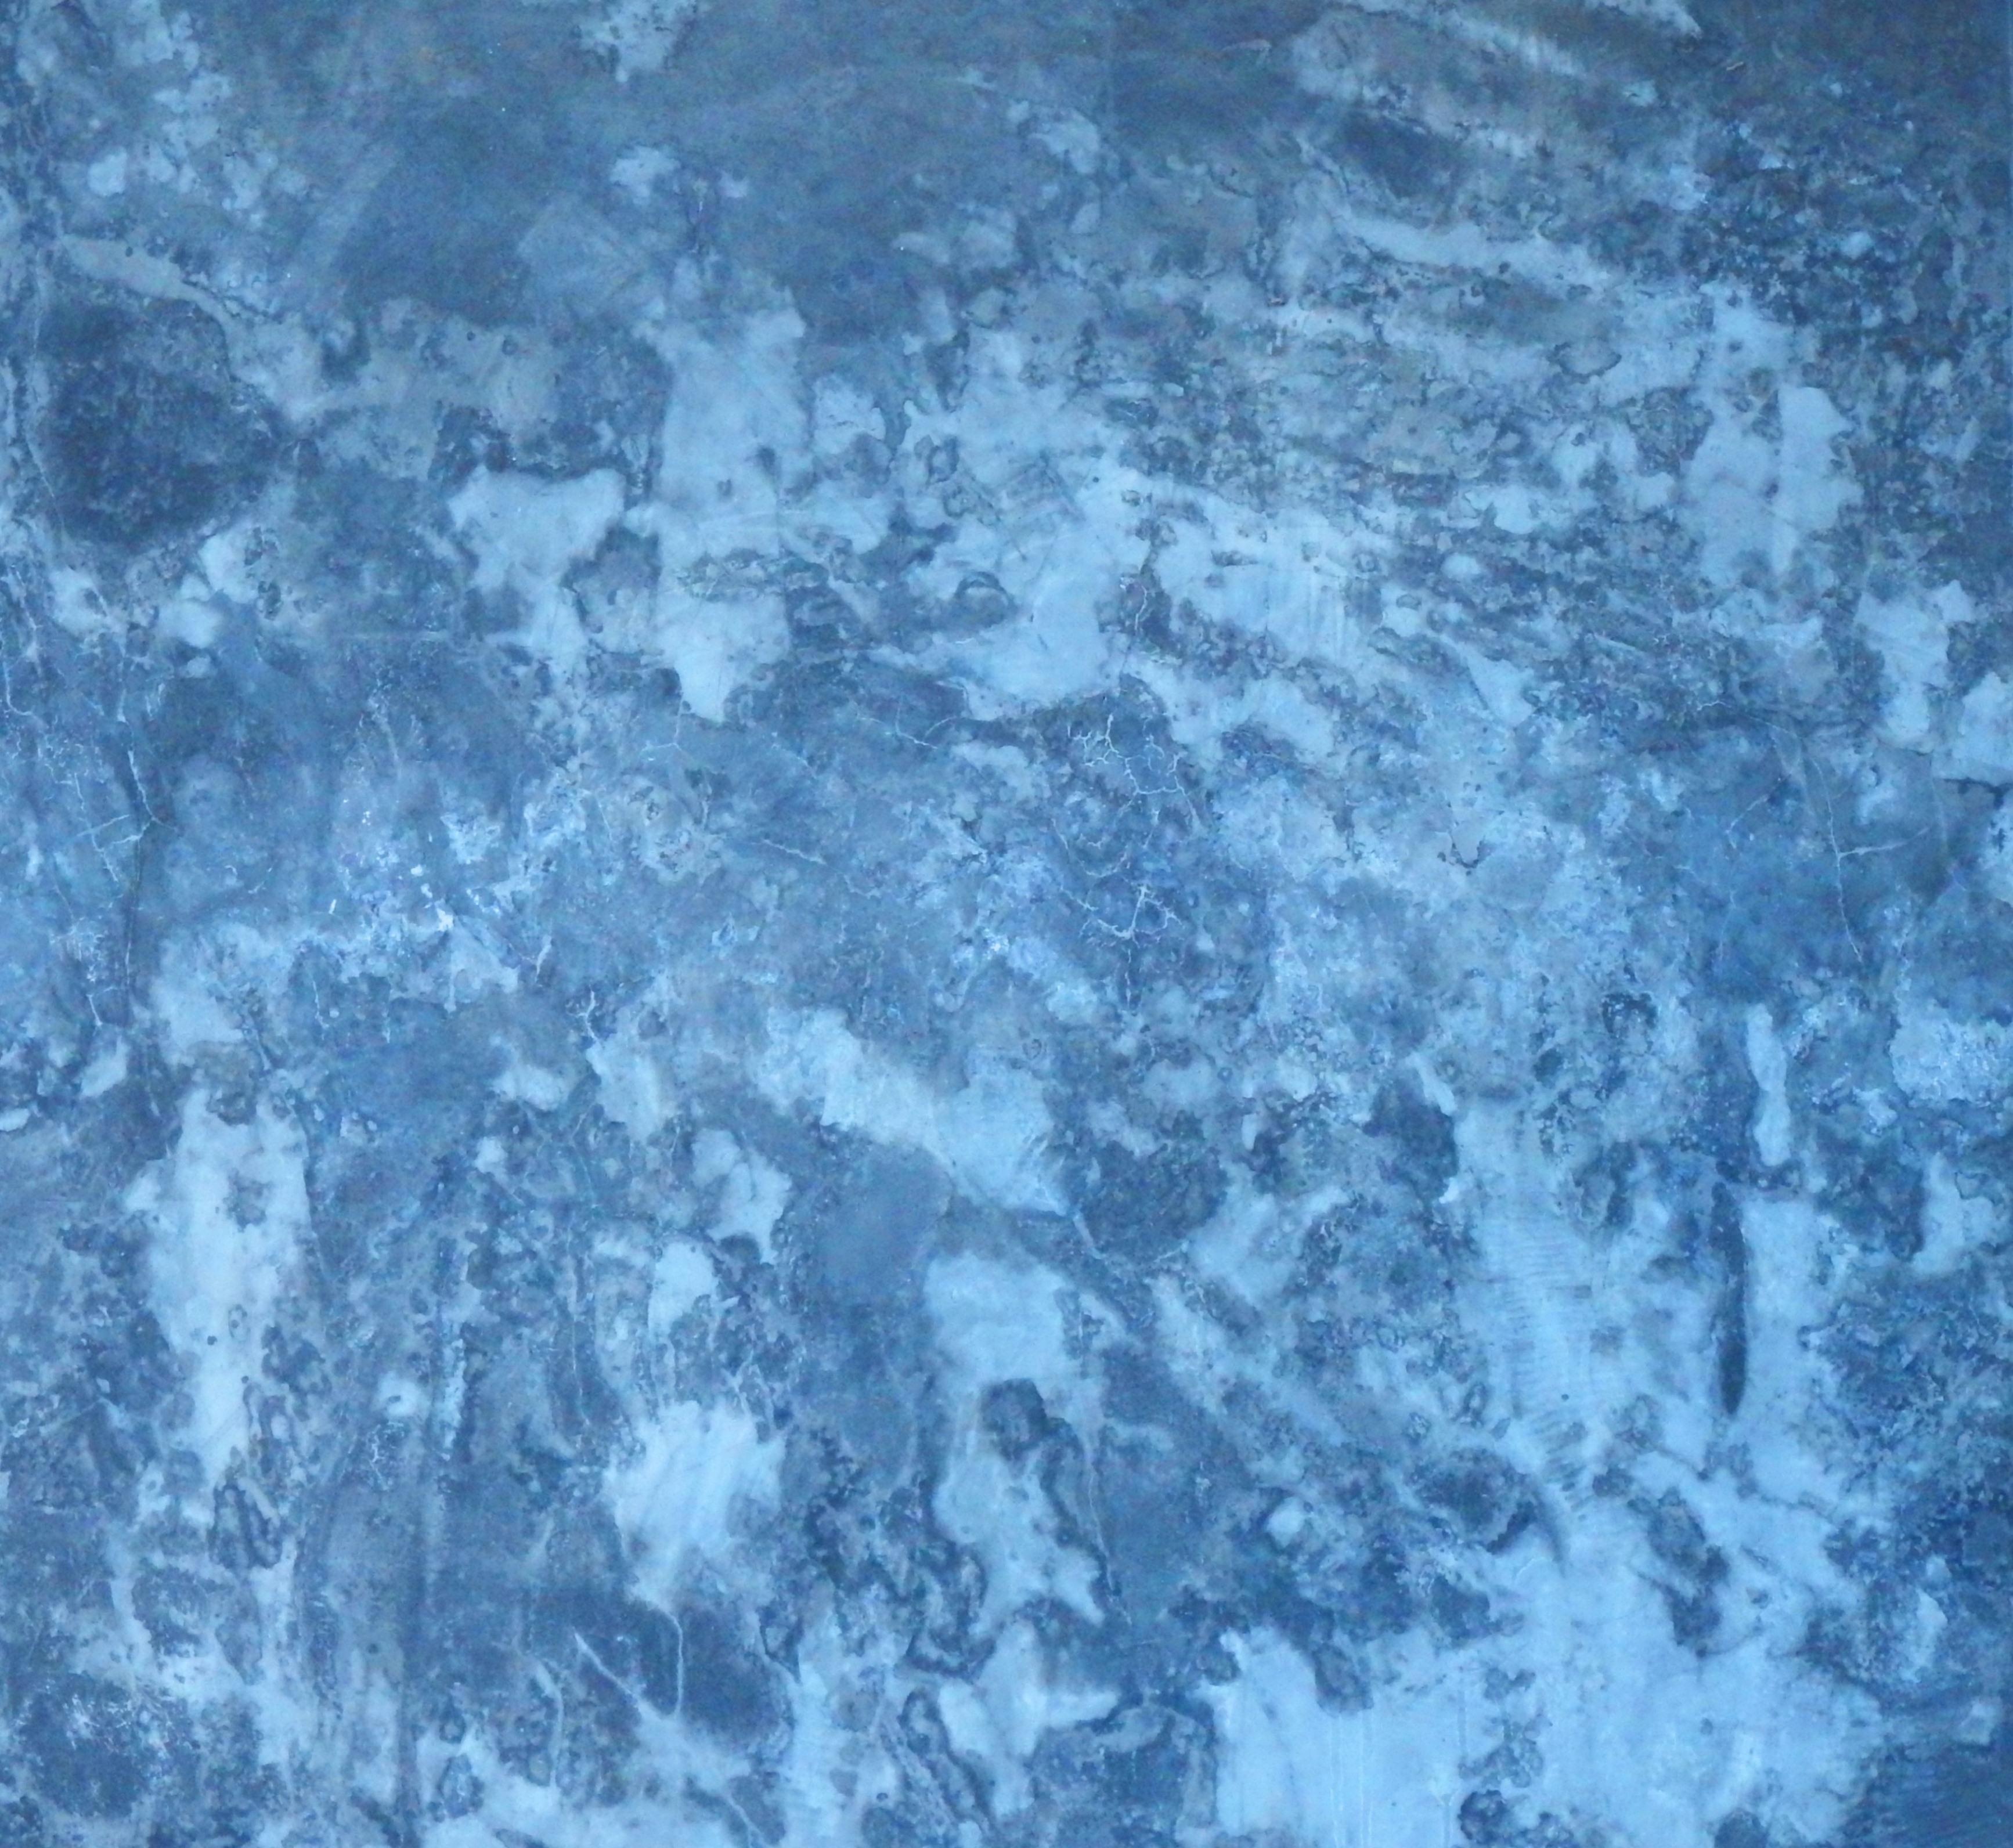 Blue concrete wall texture photo